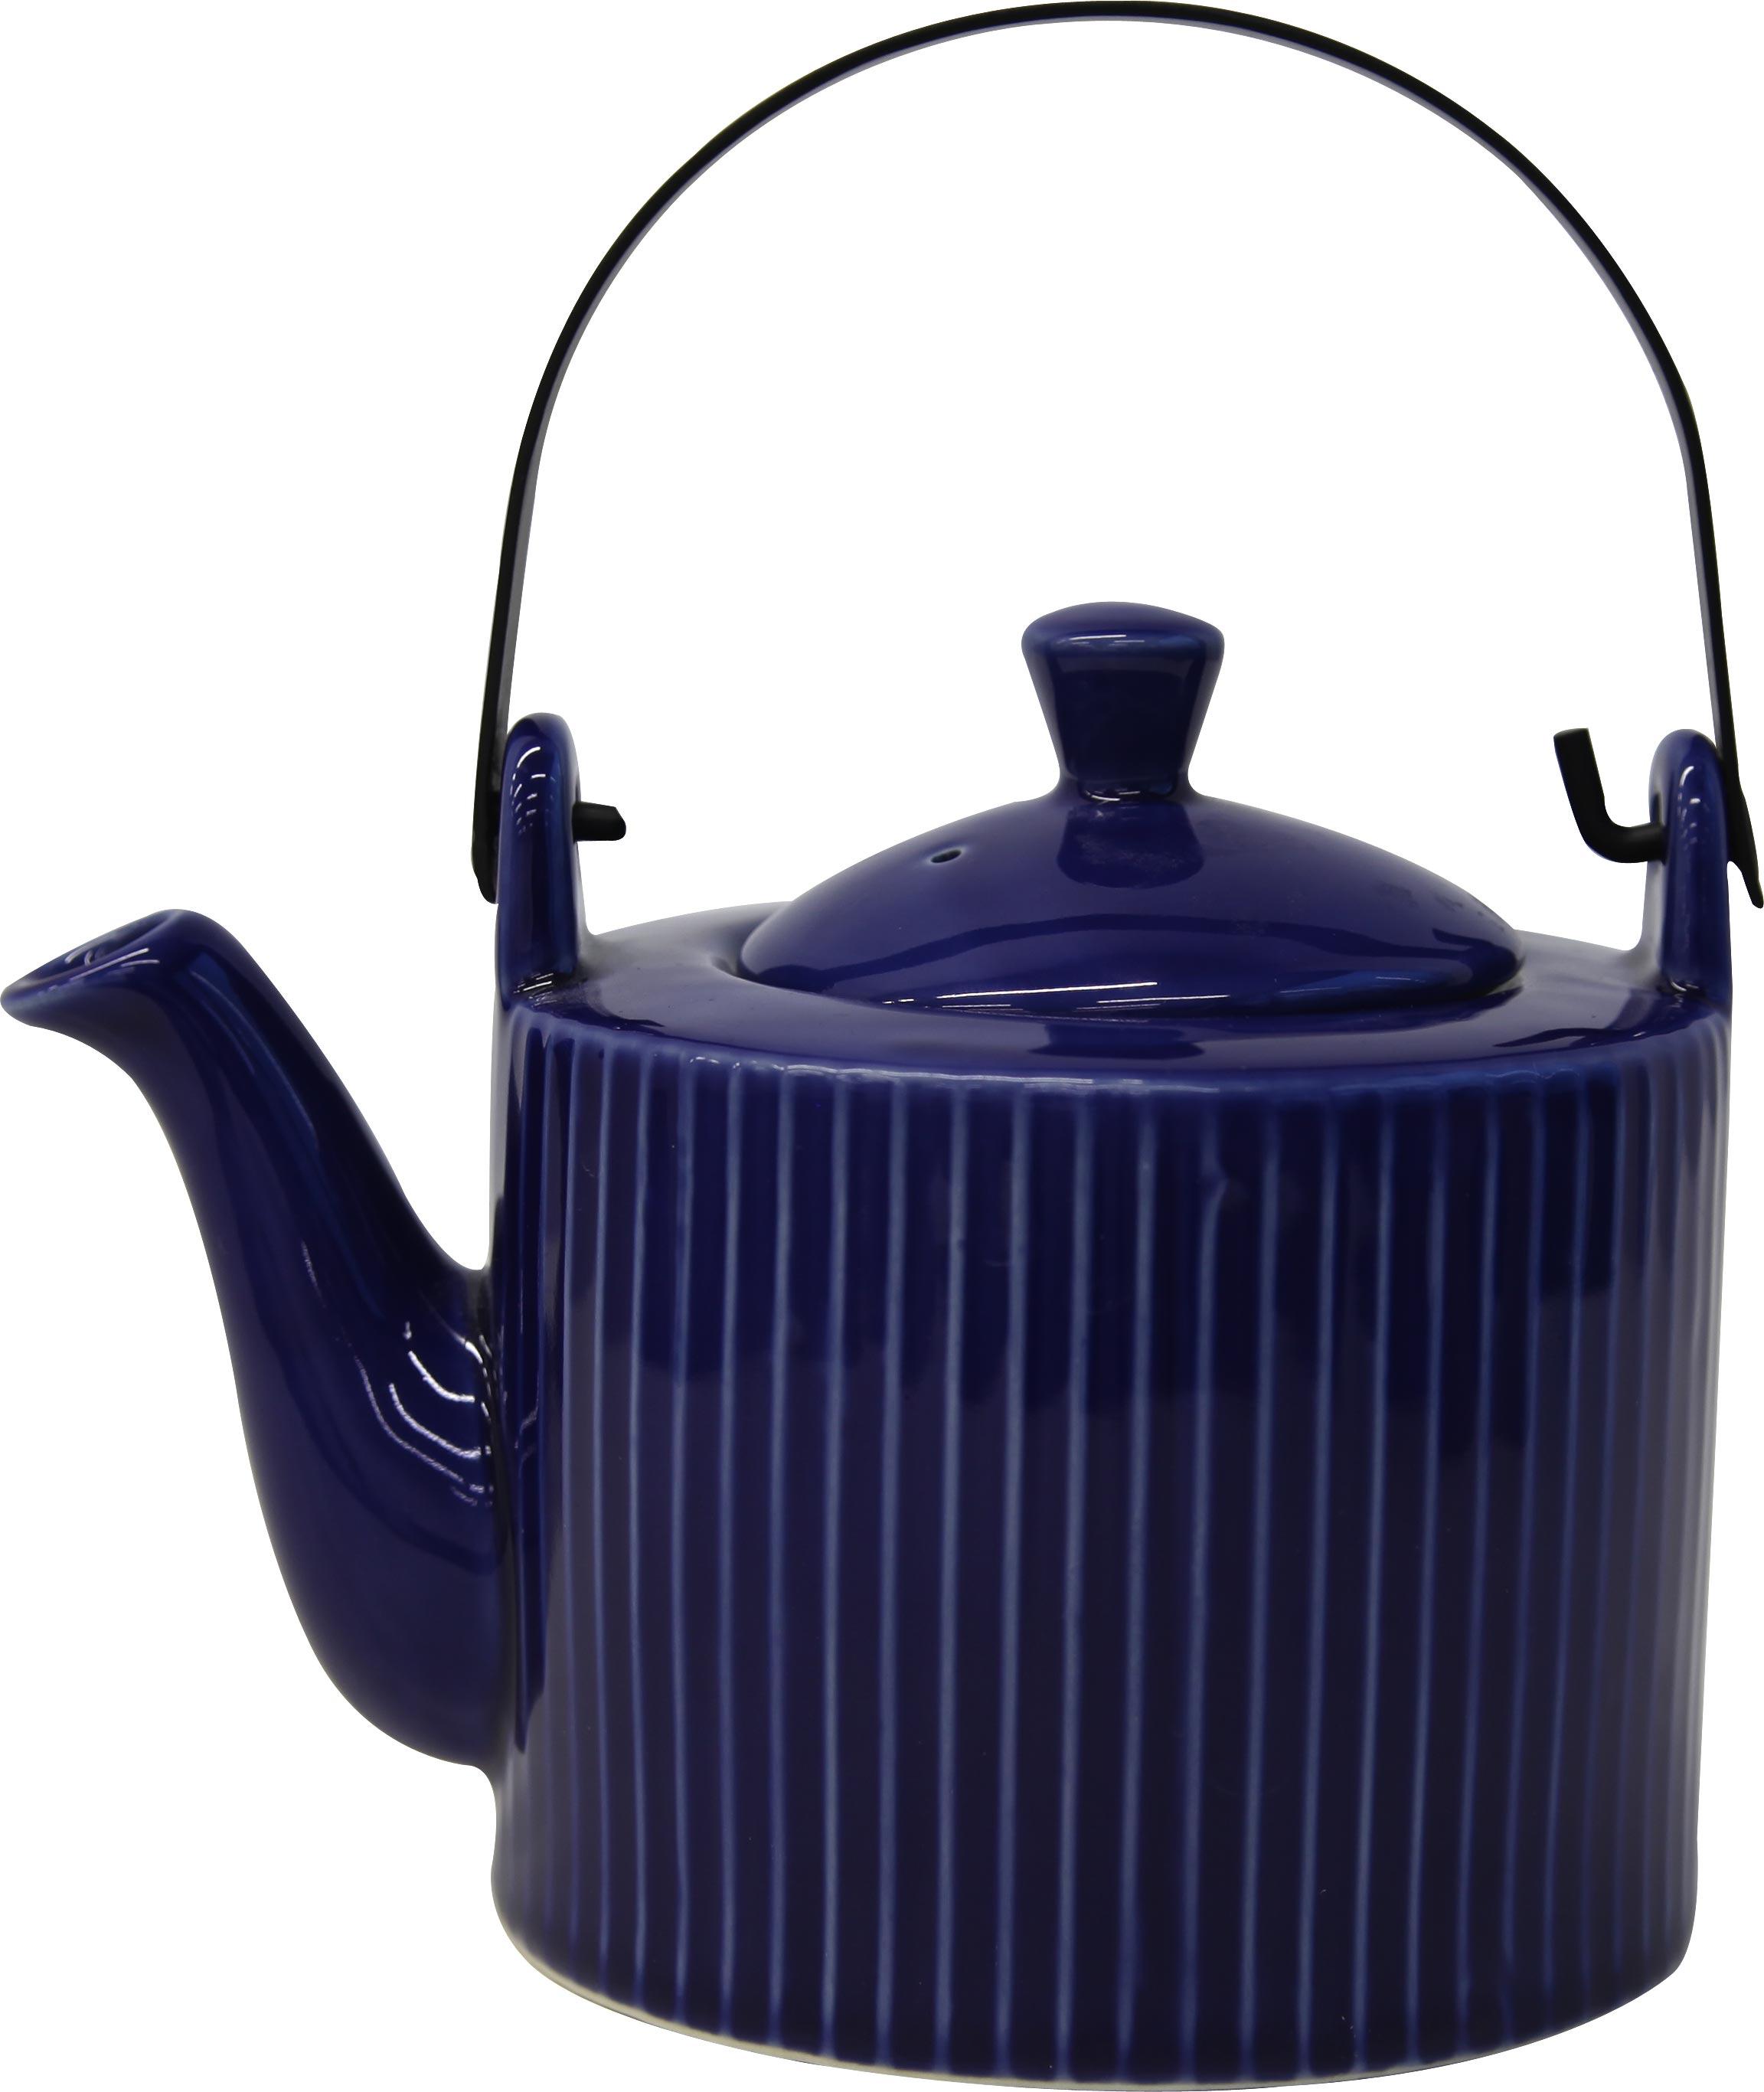 teekanne blau tassen becher kannen geschirr produkte home by asa die asa selection. Black Bedroom Furniture Sets. Home Design Ideas